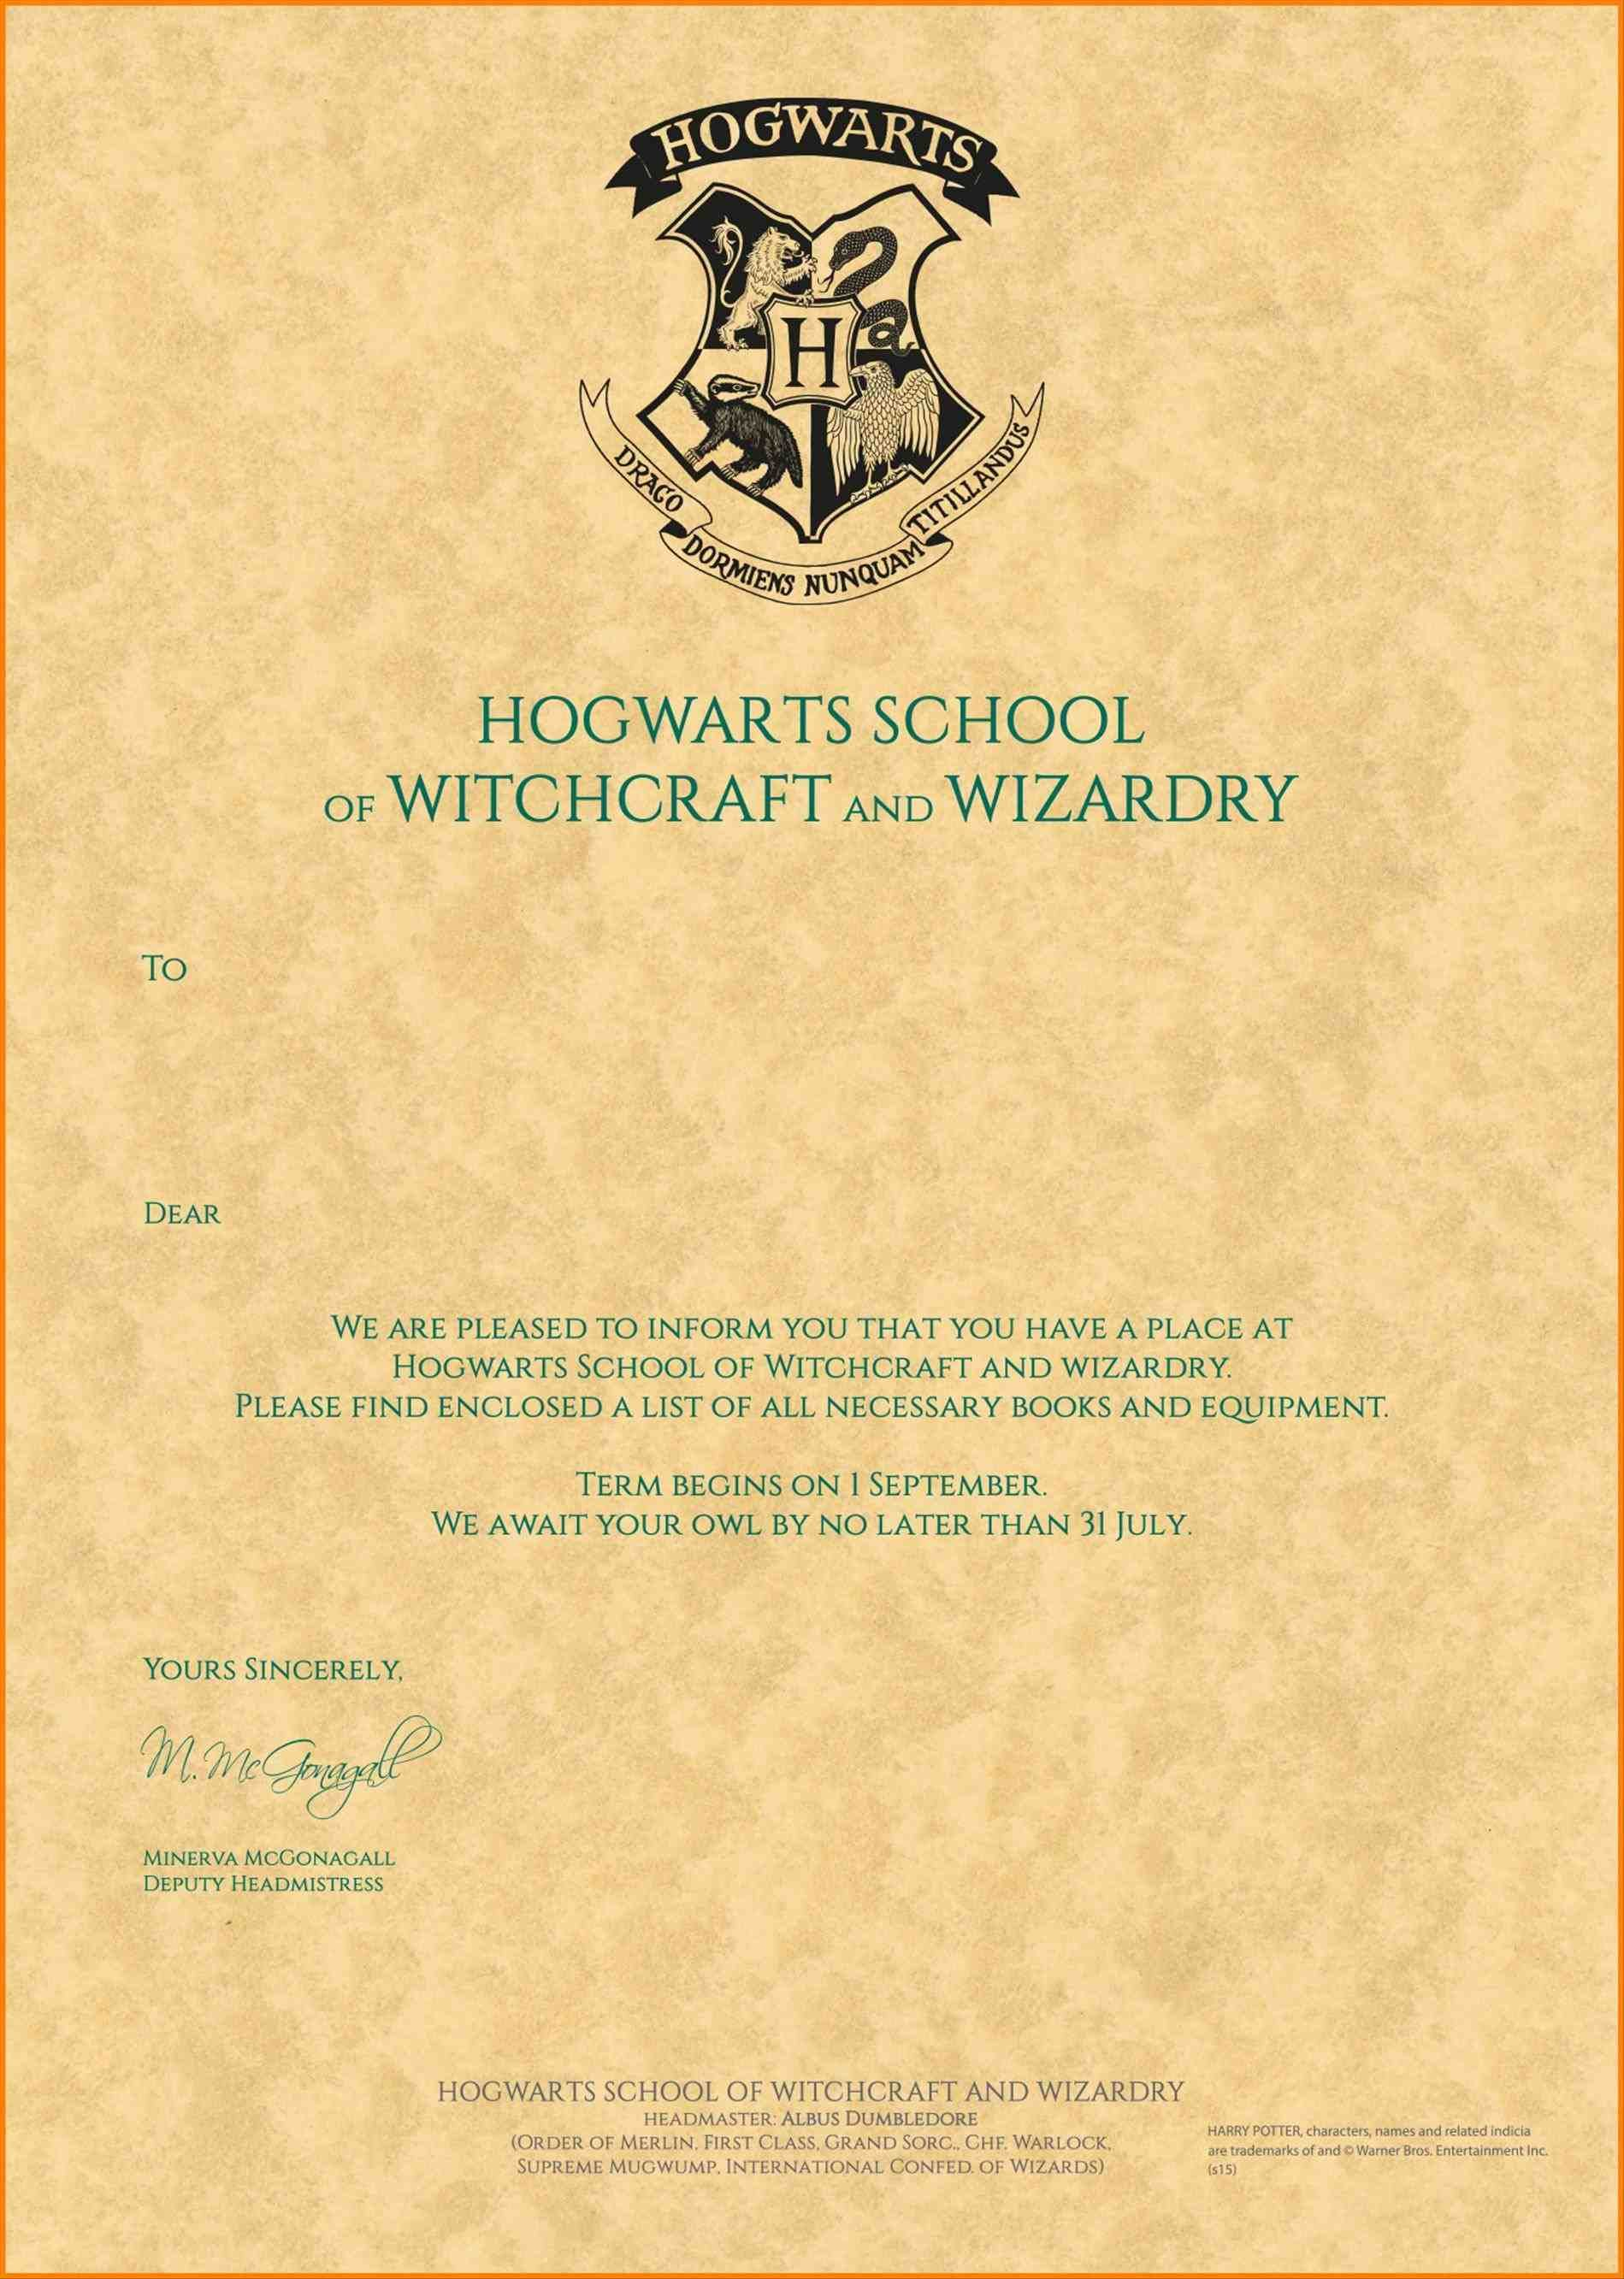 Harry Potter Hogwarts Acceptance Letter Printable By Harry Potter